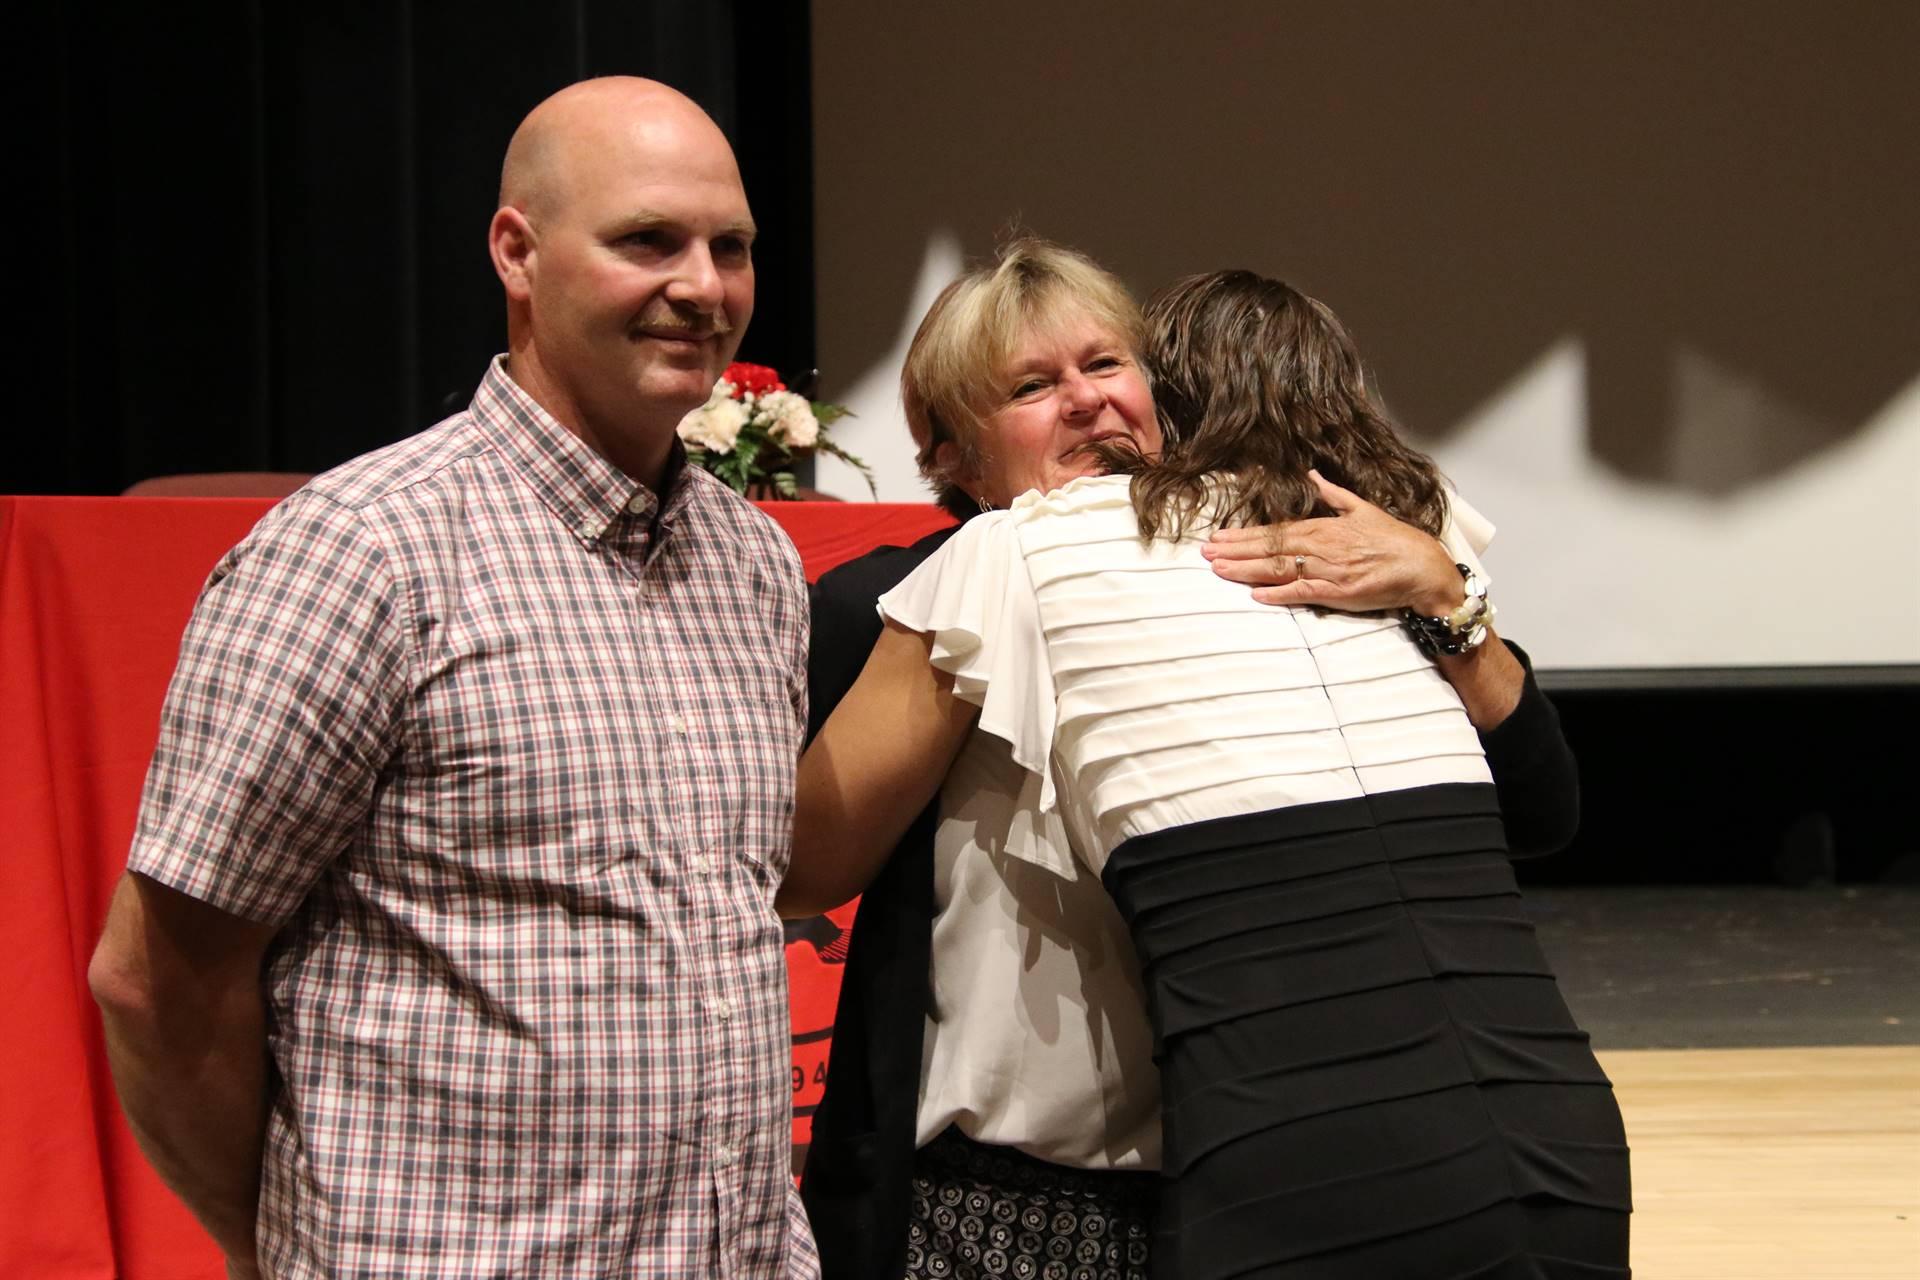 Hall of Distinction honoree hugging attendee